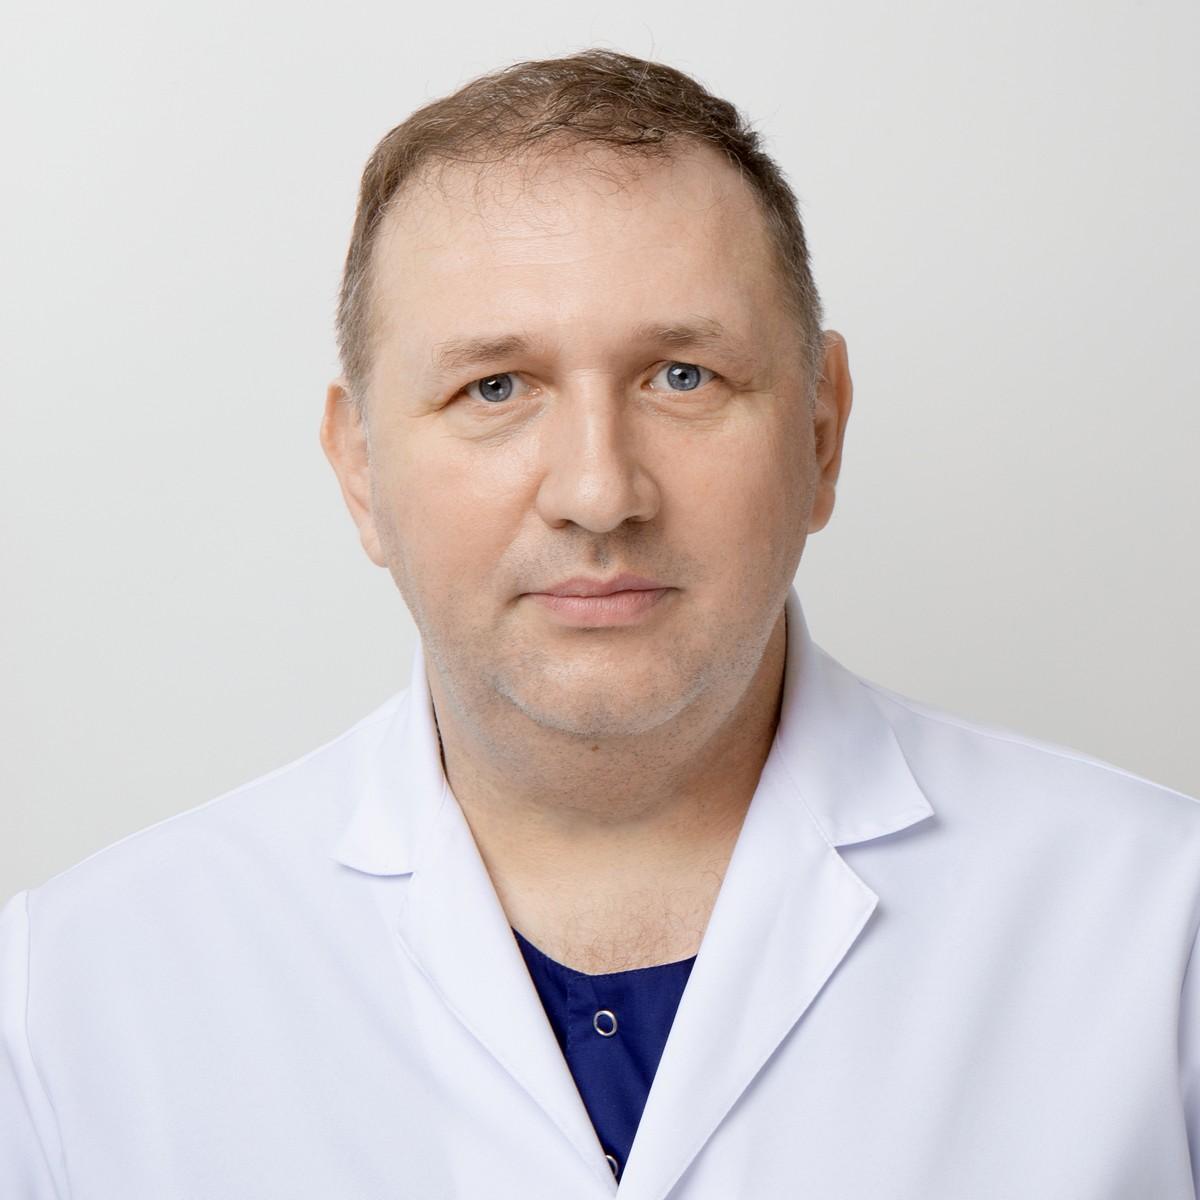 Илларионов Олег Александрович